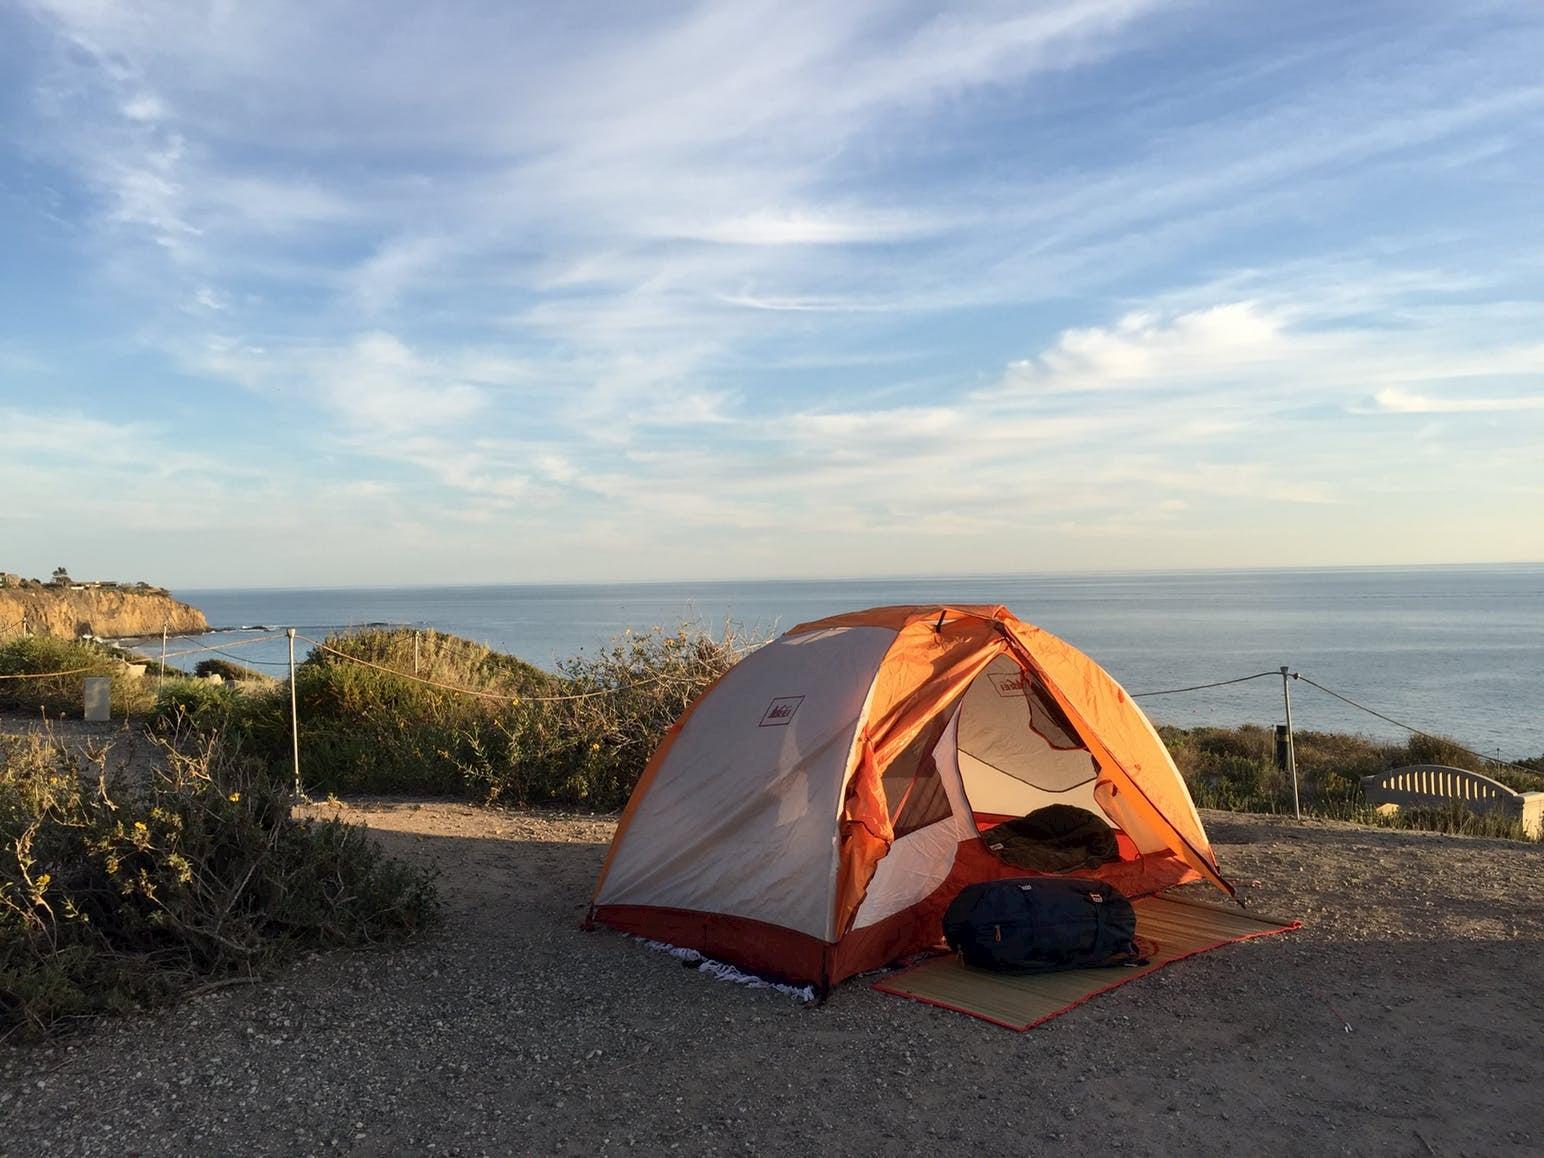 Orange tent setup at coastal campsite.